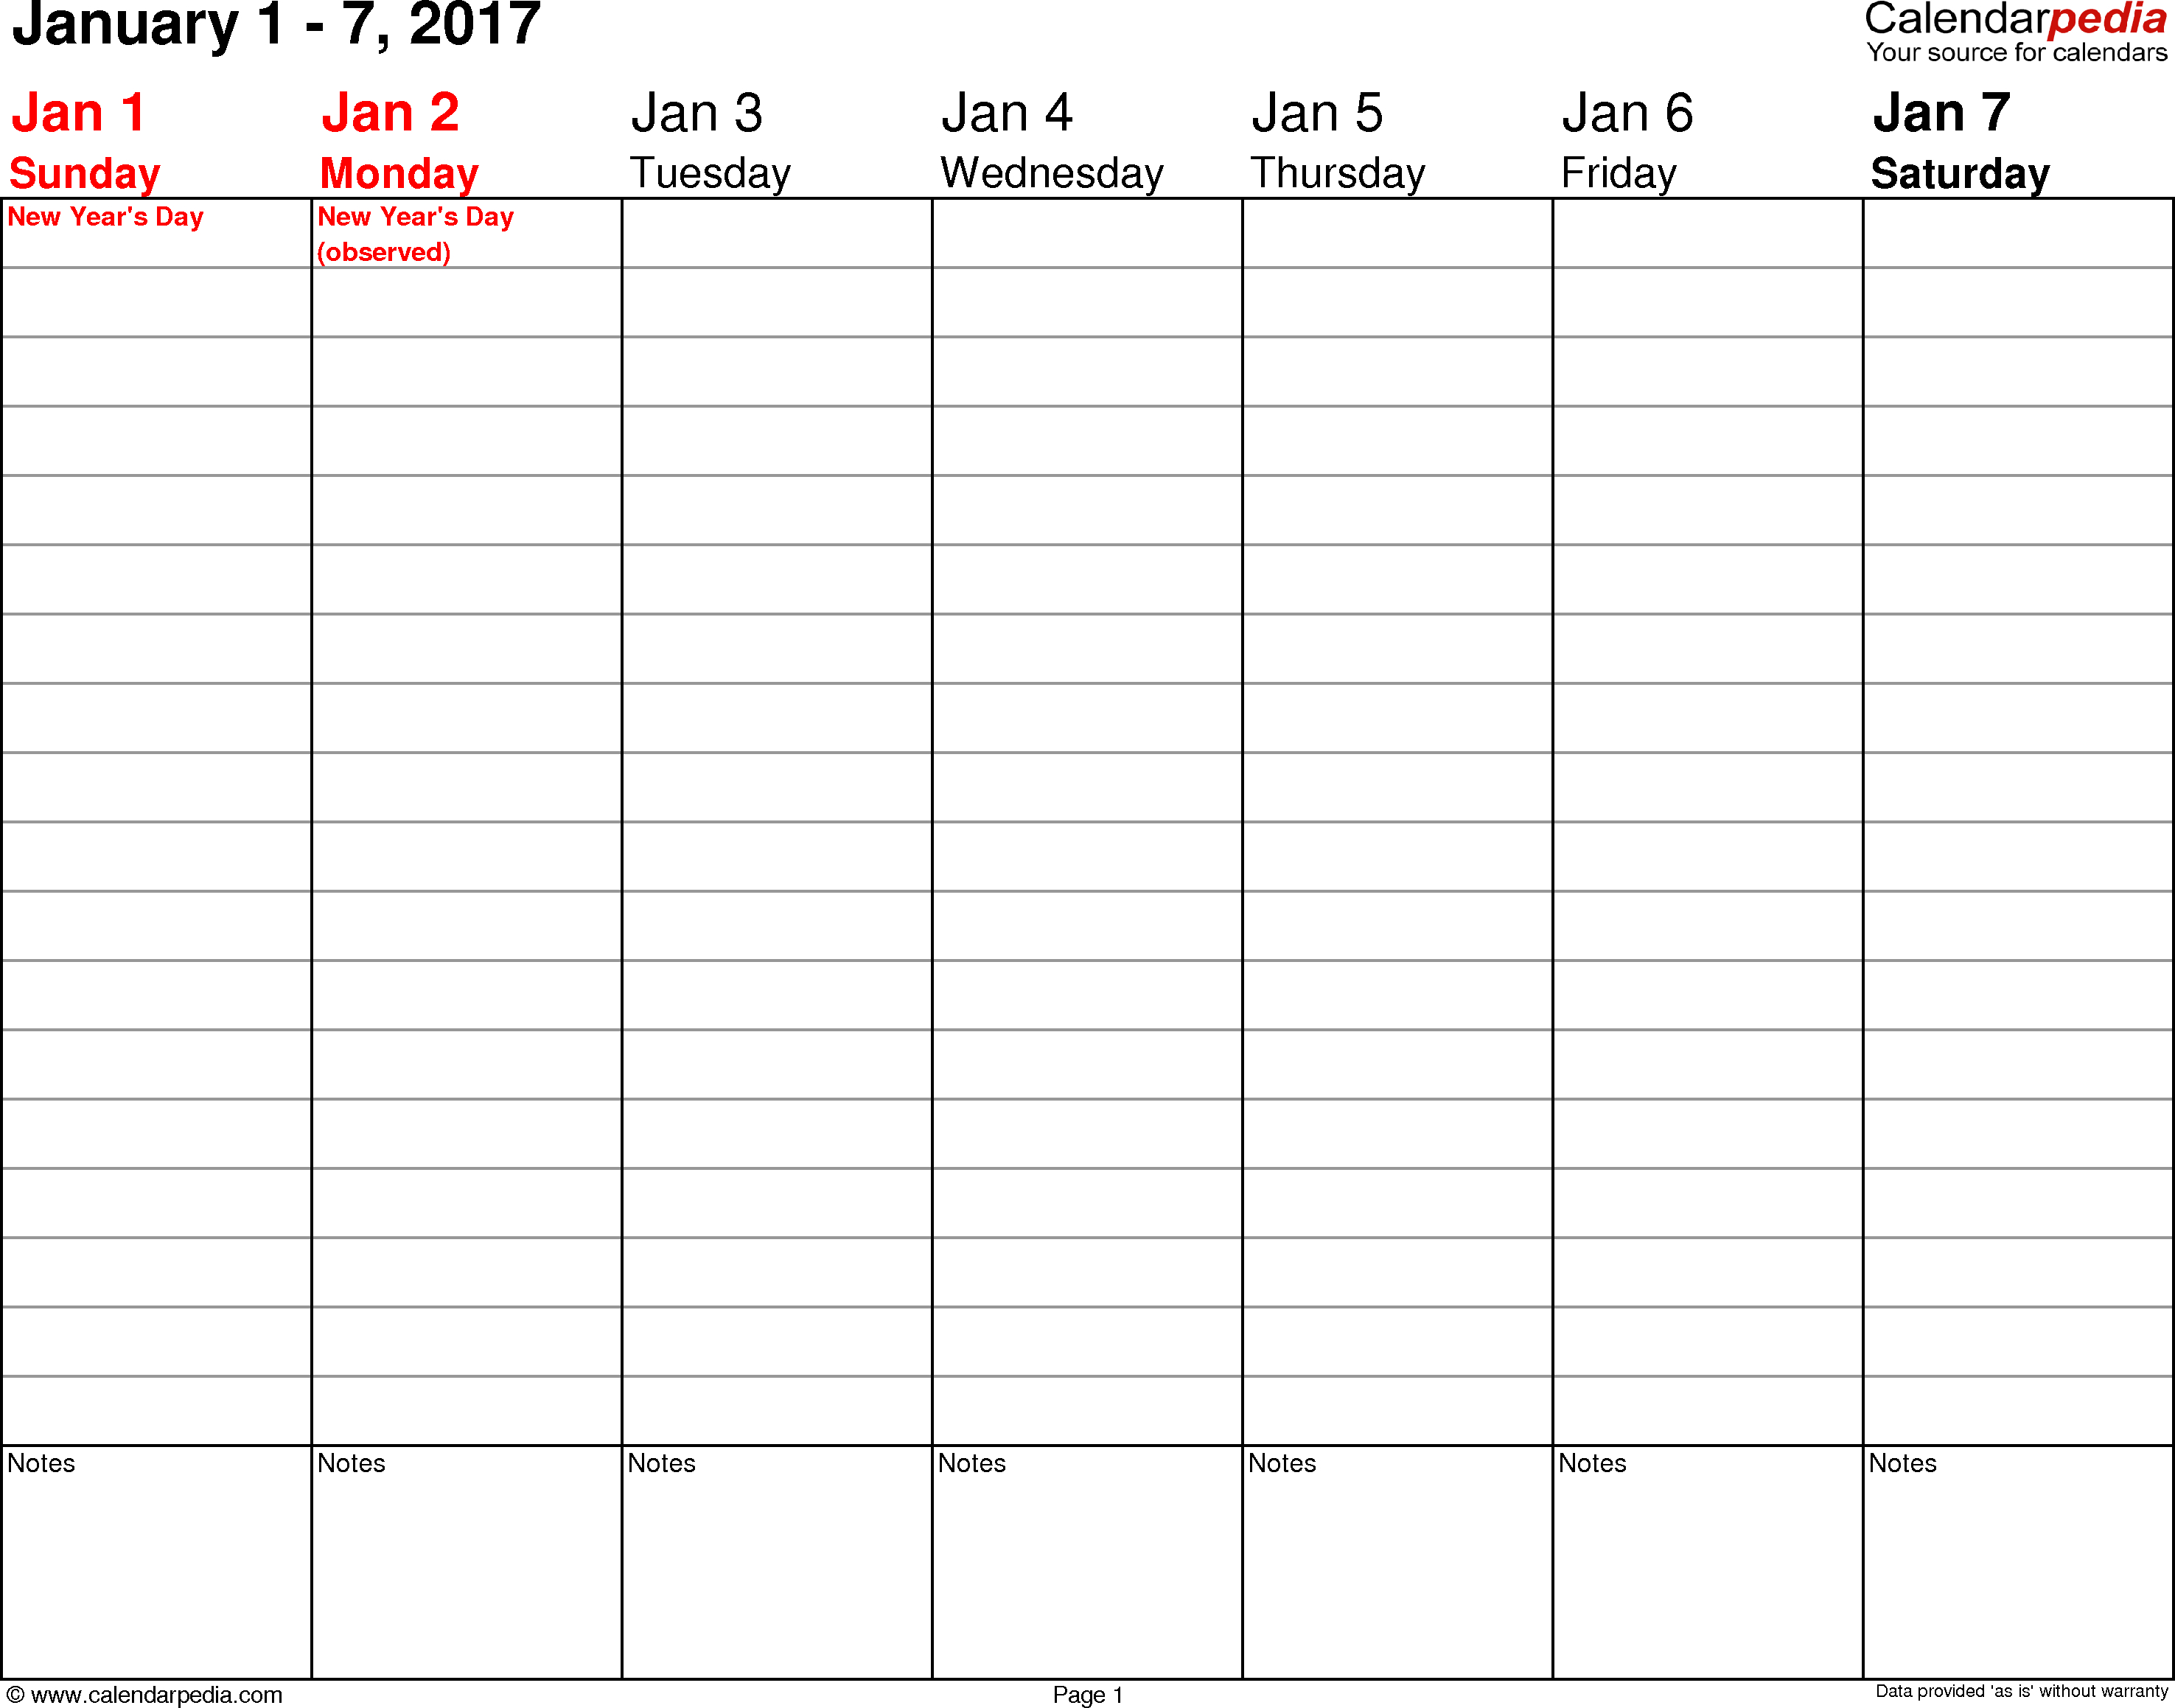 Weekly Calendar 2017 For Word - 12 Free Printable Templates - Free Printable Agenda 2017